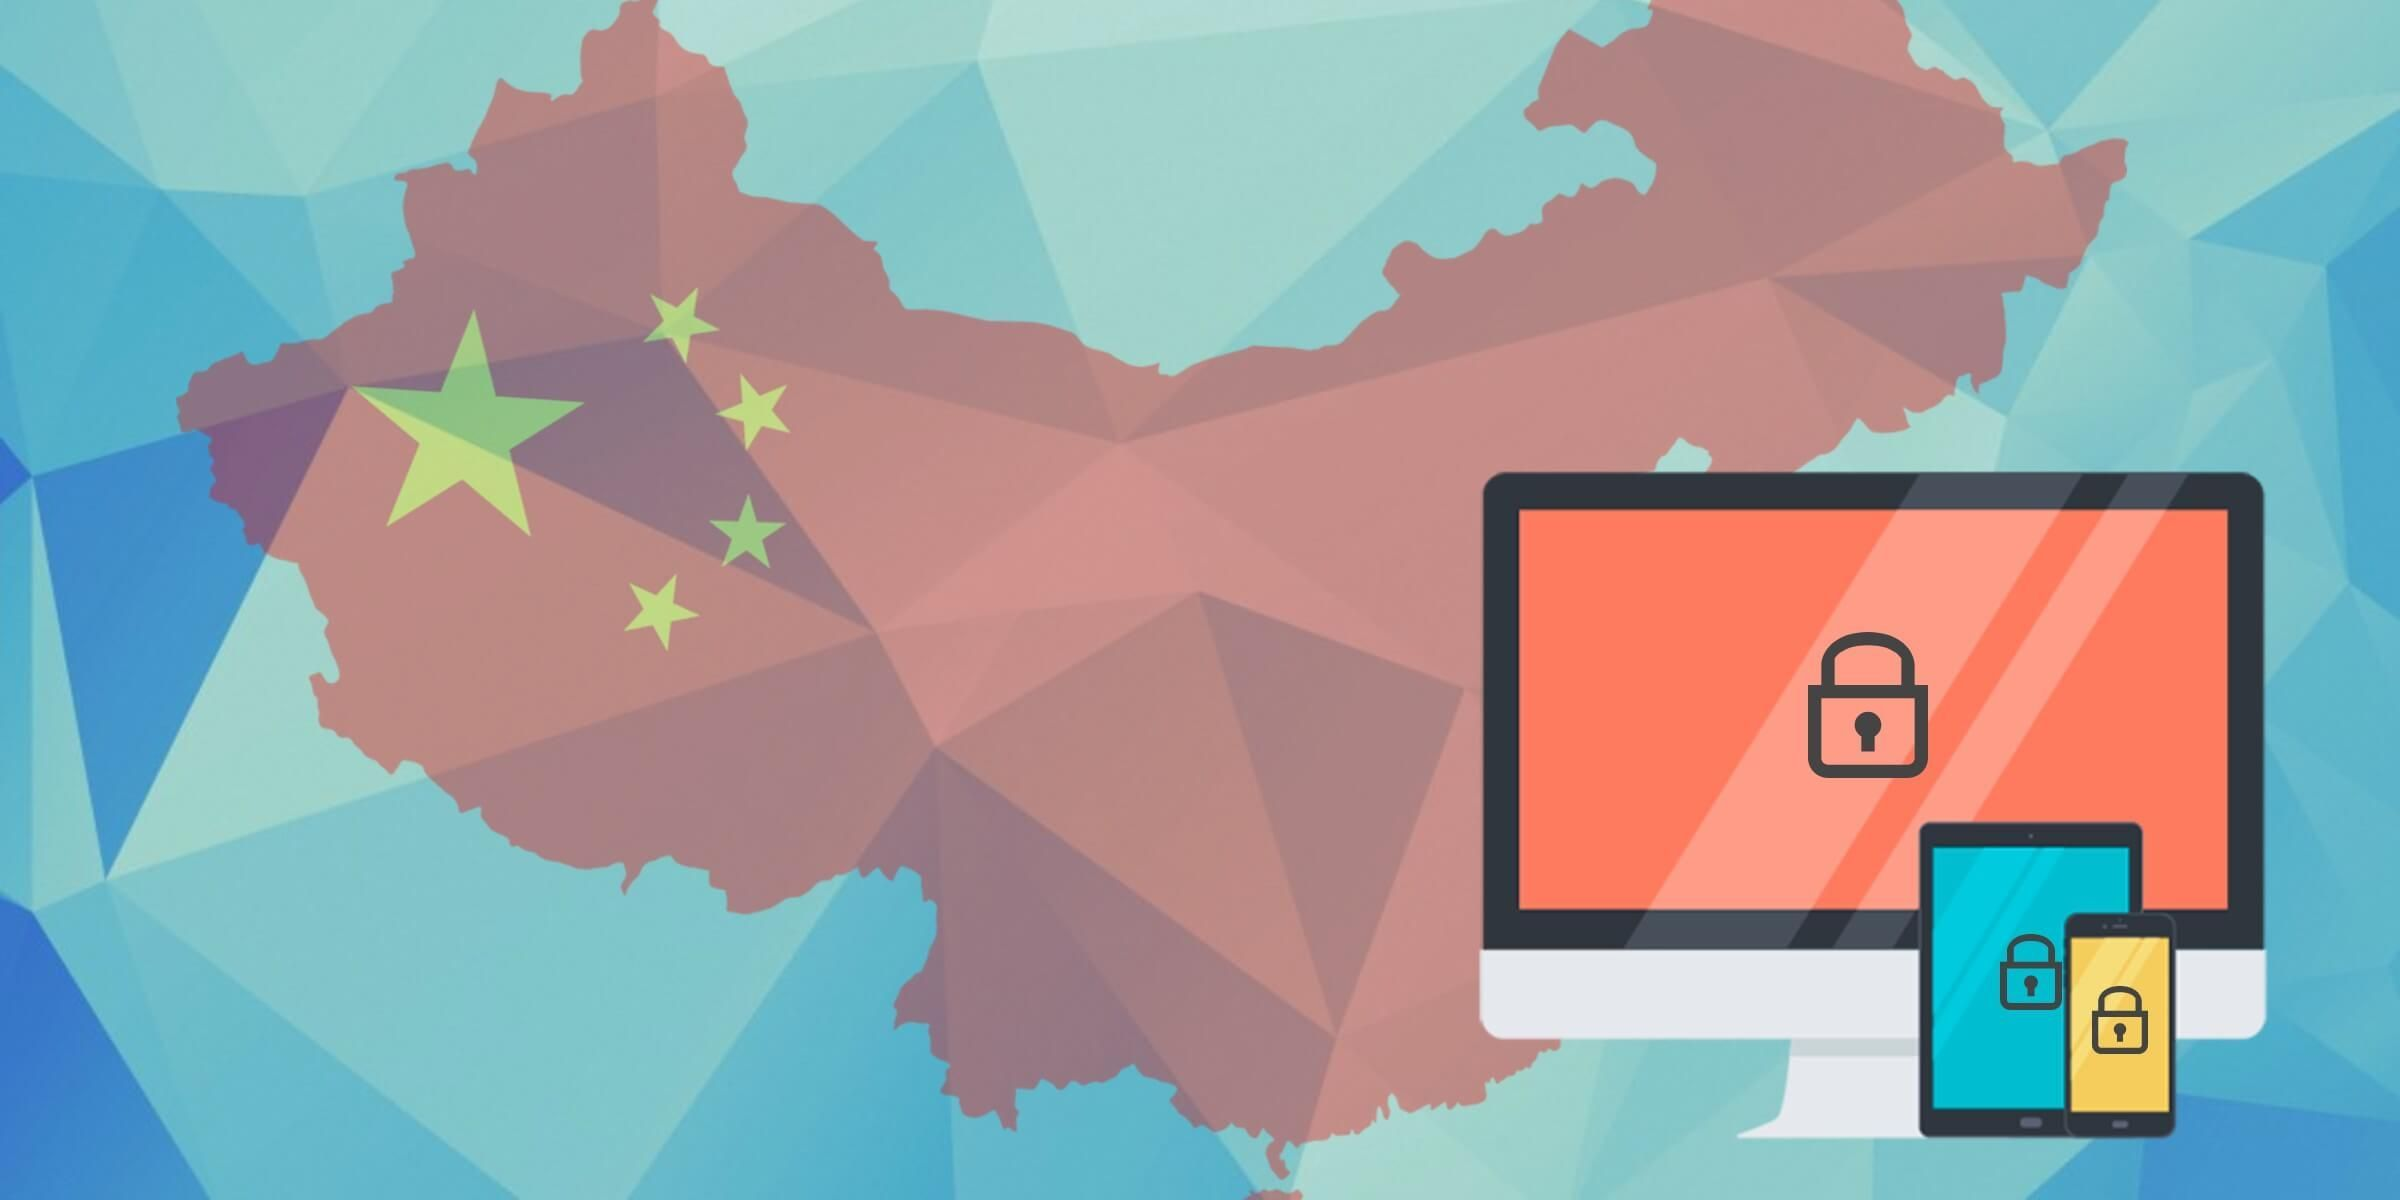 0a723f9e59b93c9e8217898b3a95e832 - Vpn That Works In China Free